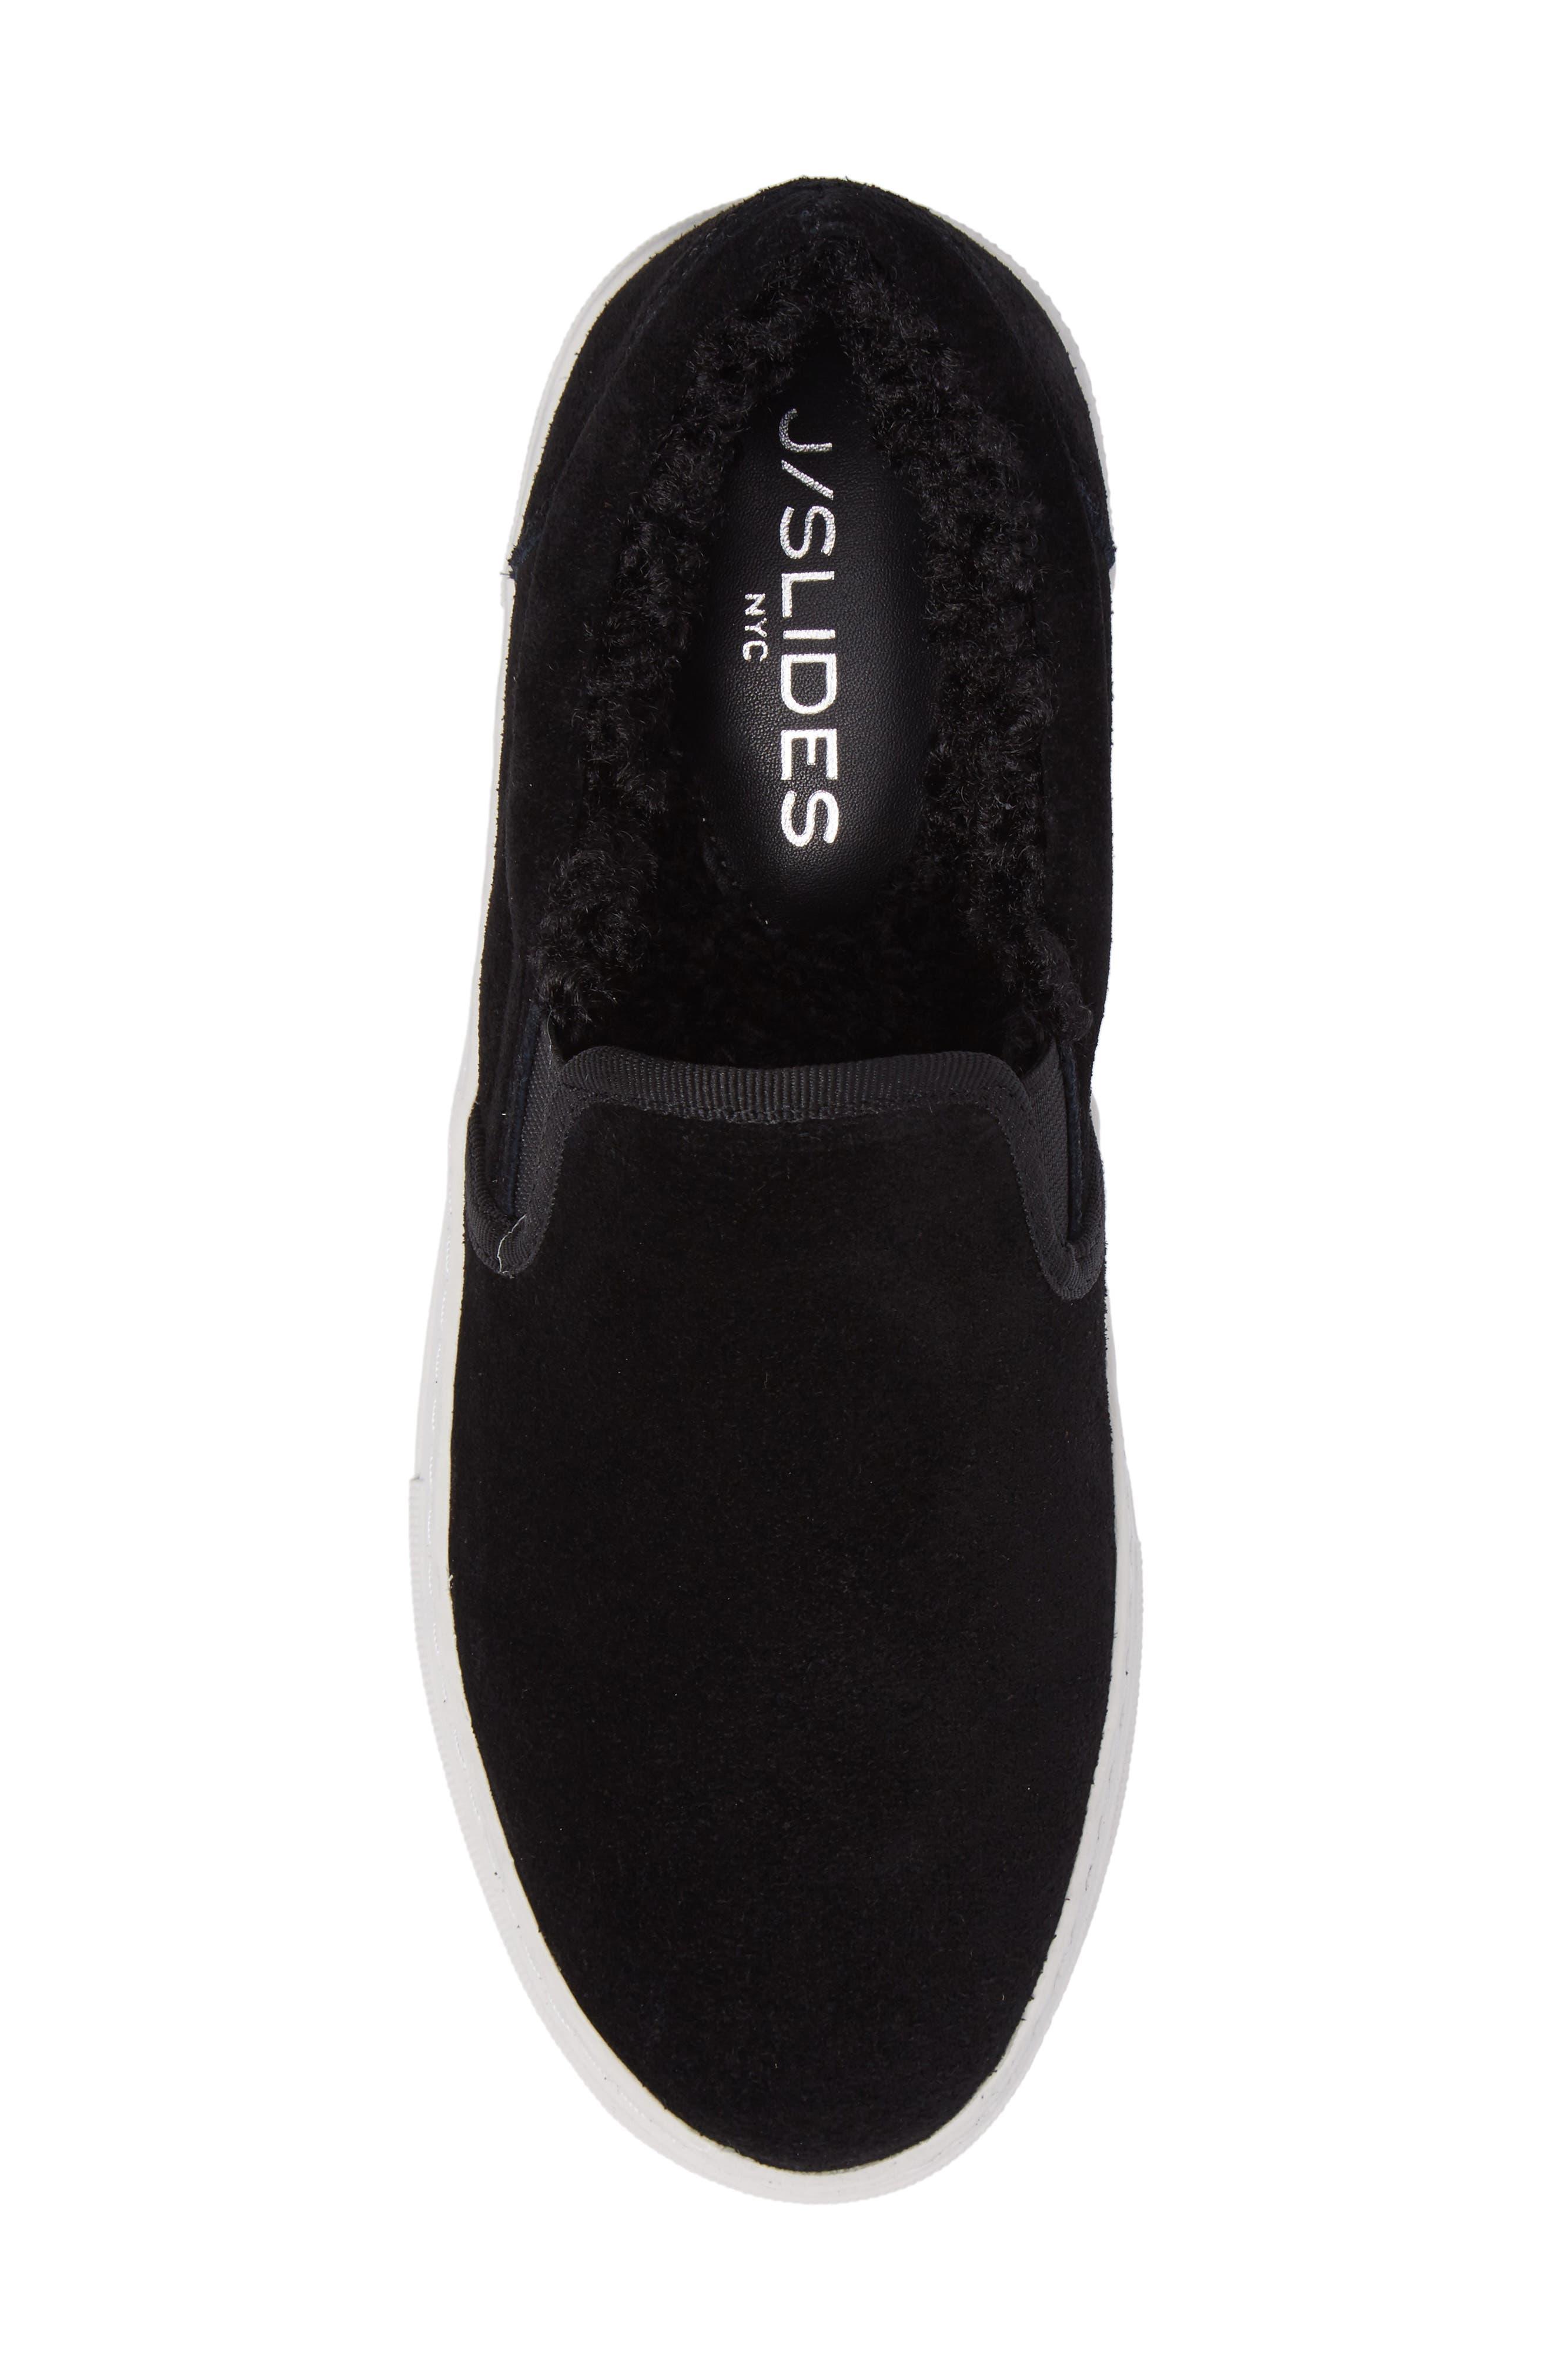 Arpel Faux Fur Lined Slip-On Sneaker,                             Alternate thumbnail 5, color,                             Black Suede